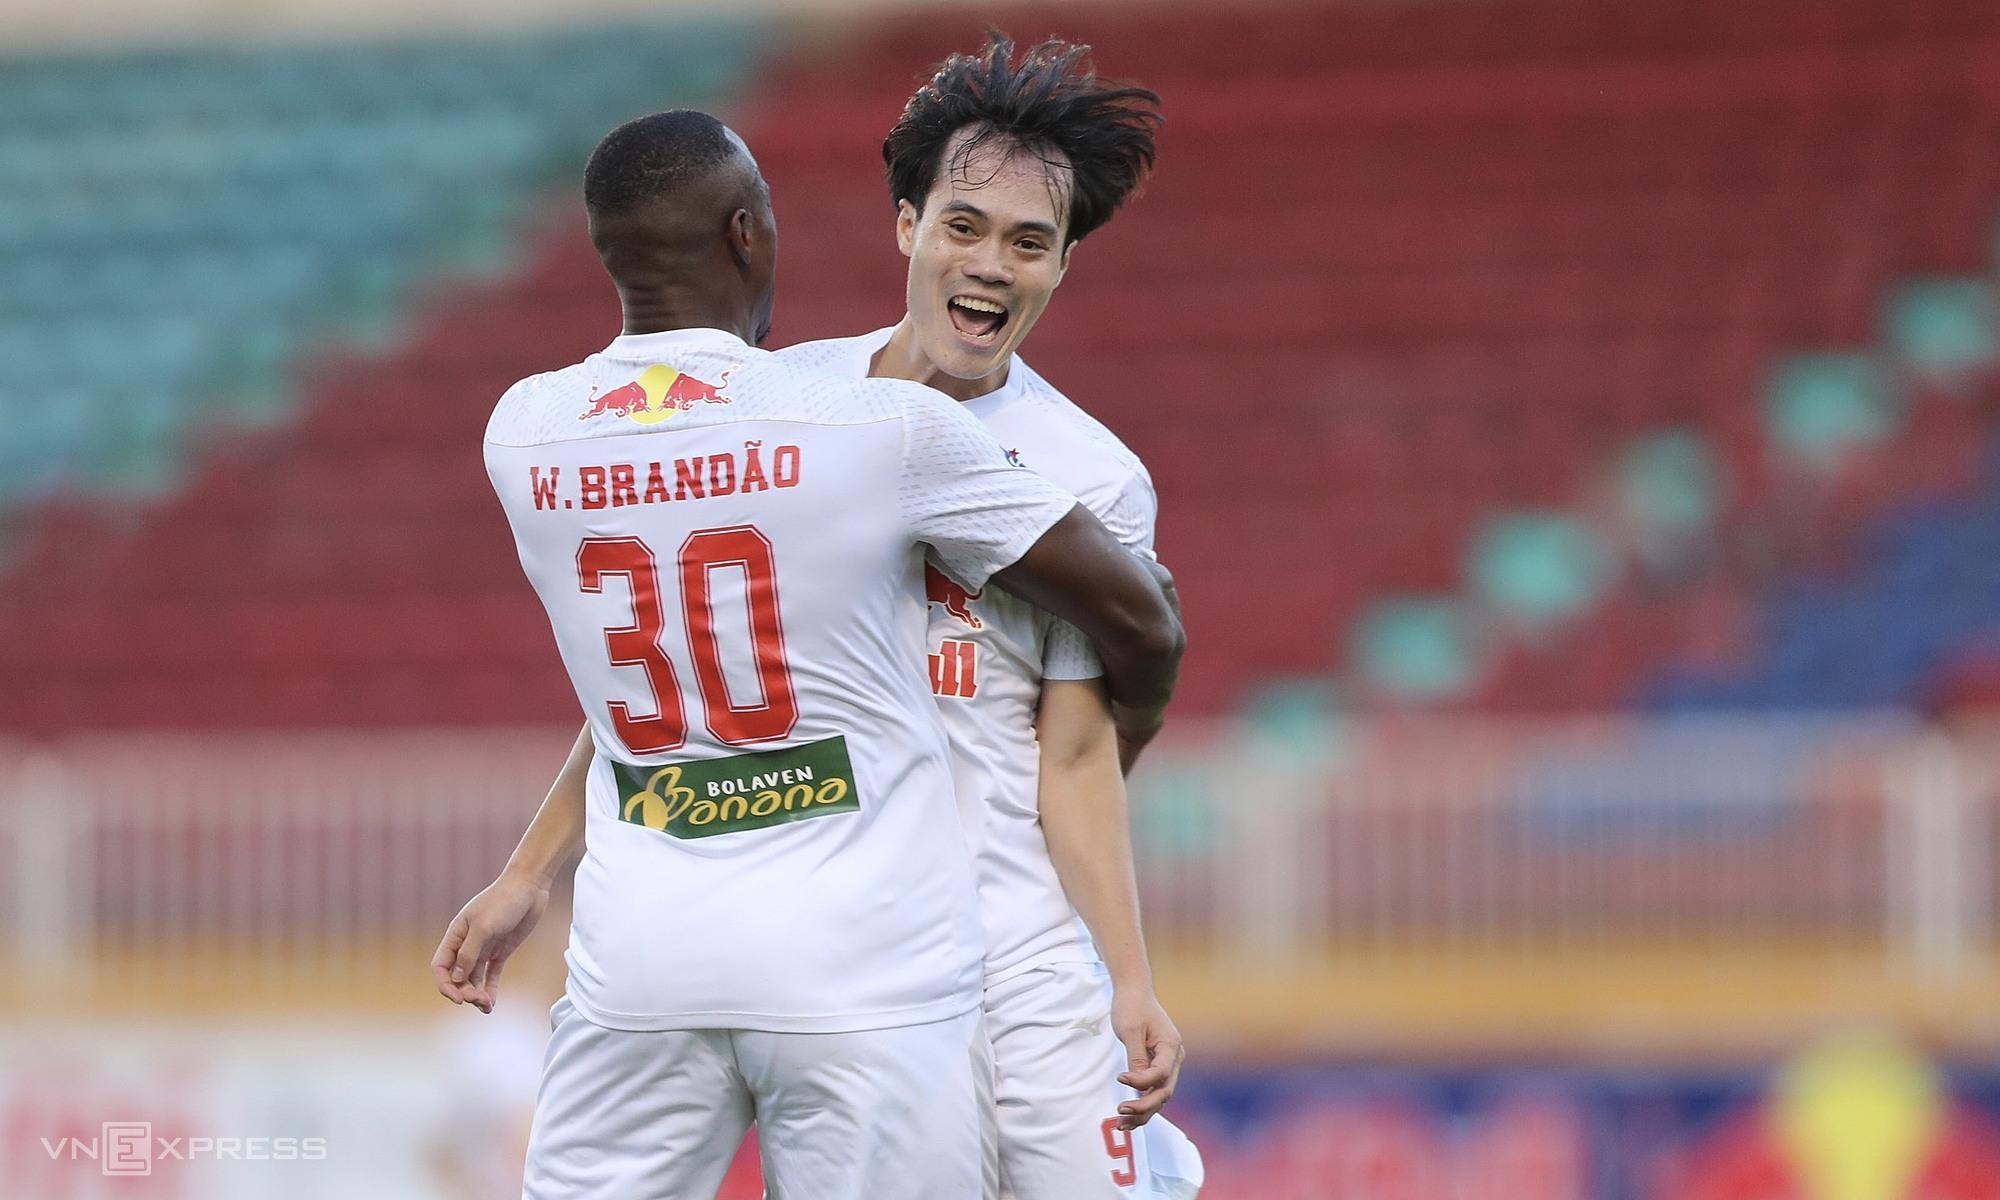 Brandao membantu Van Toan menjadi dobel utama dalam serangan HAGL.  Foto: Duc Dong